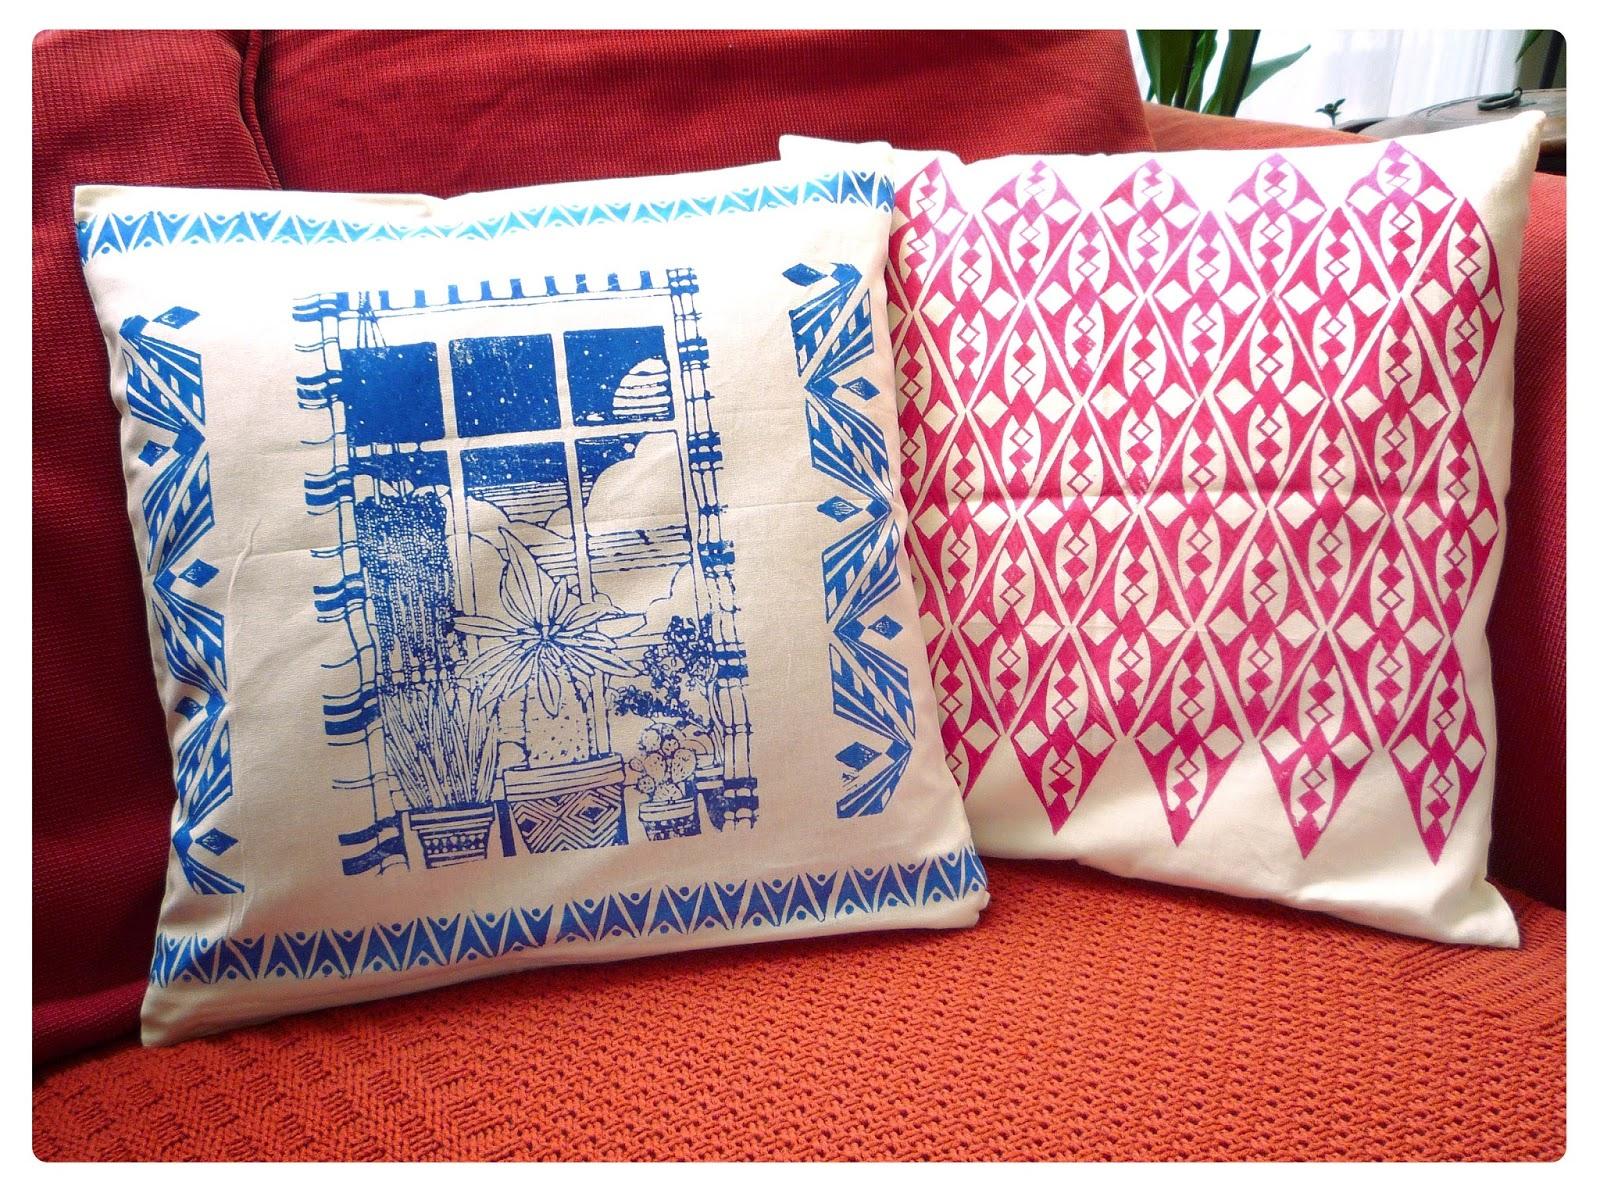 le bal des sylphes impression textile linogravure. Black Bedroom Furniture Sets. Home Design Ideas